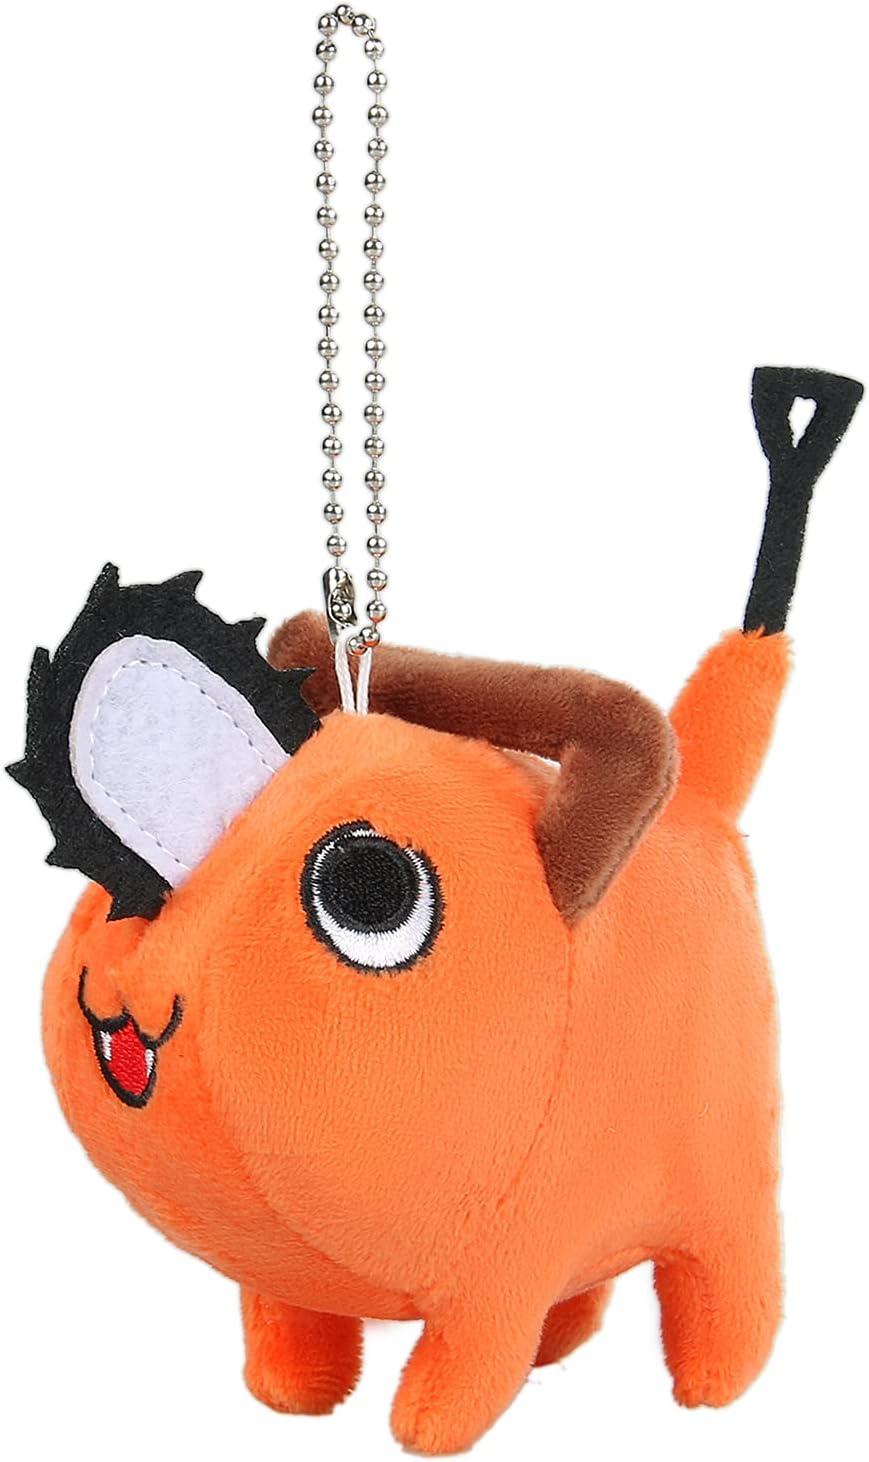 Chainsaw Man online shopping Cosplay Pochita Plush Stuffed Sale special price Dolls Anime 10